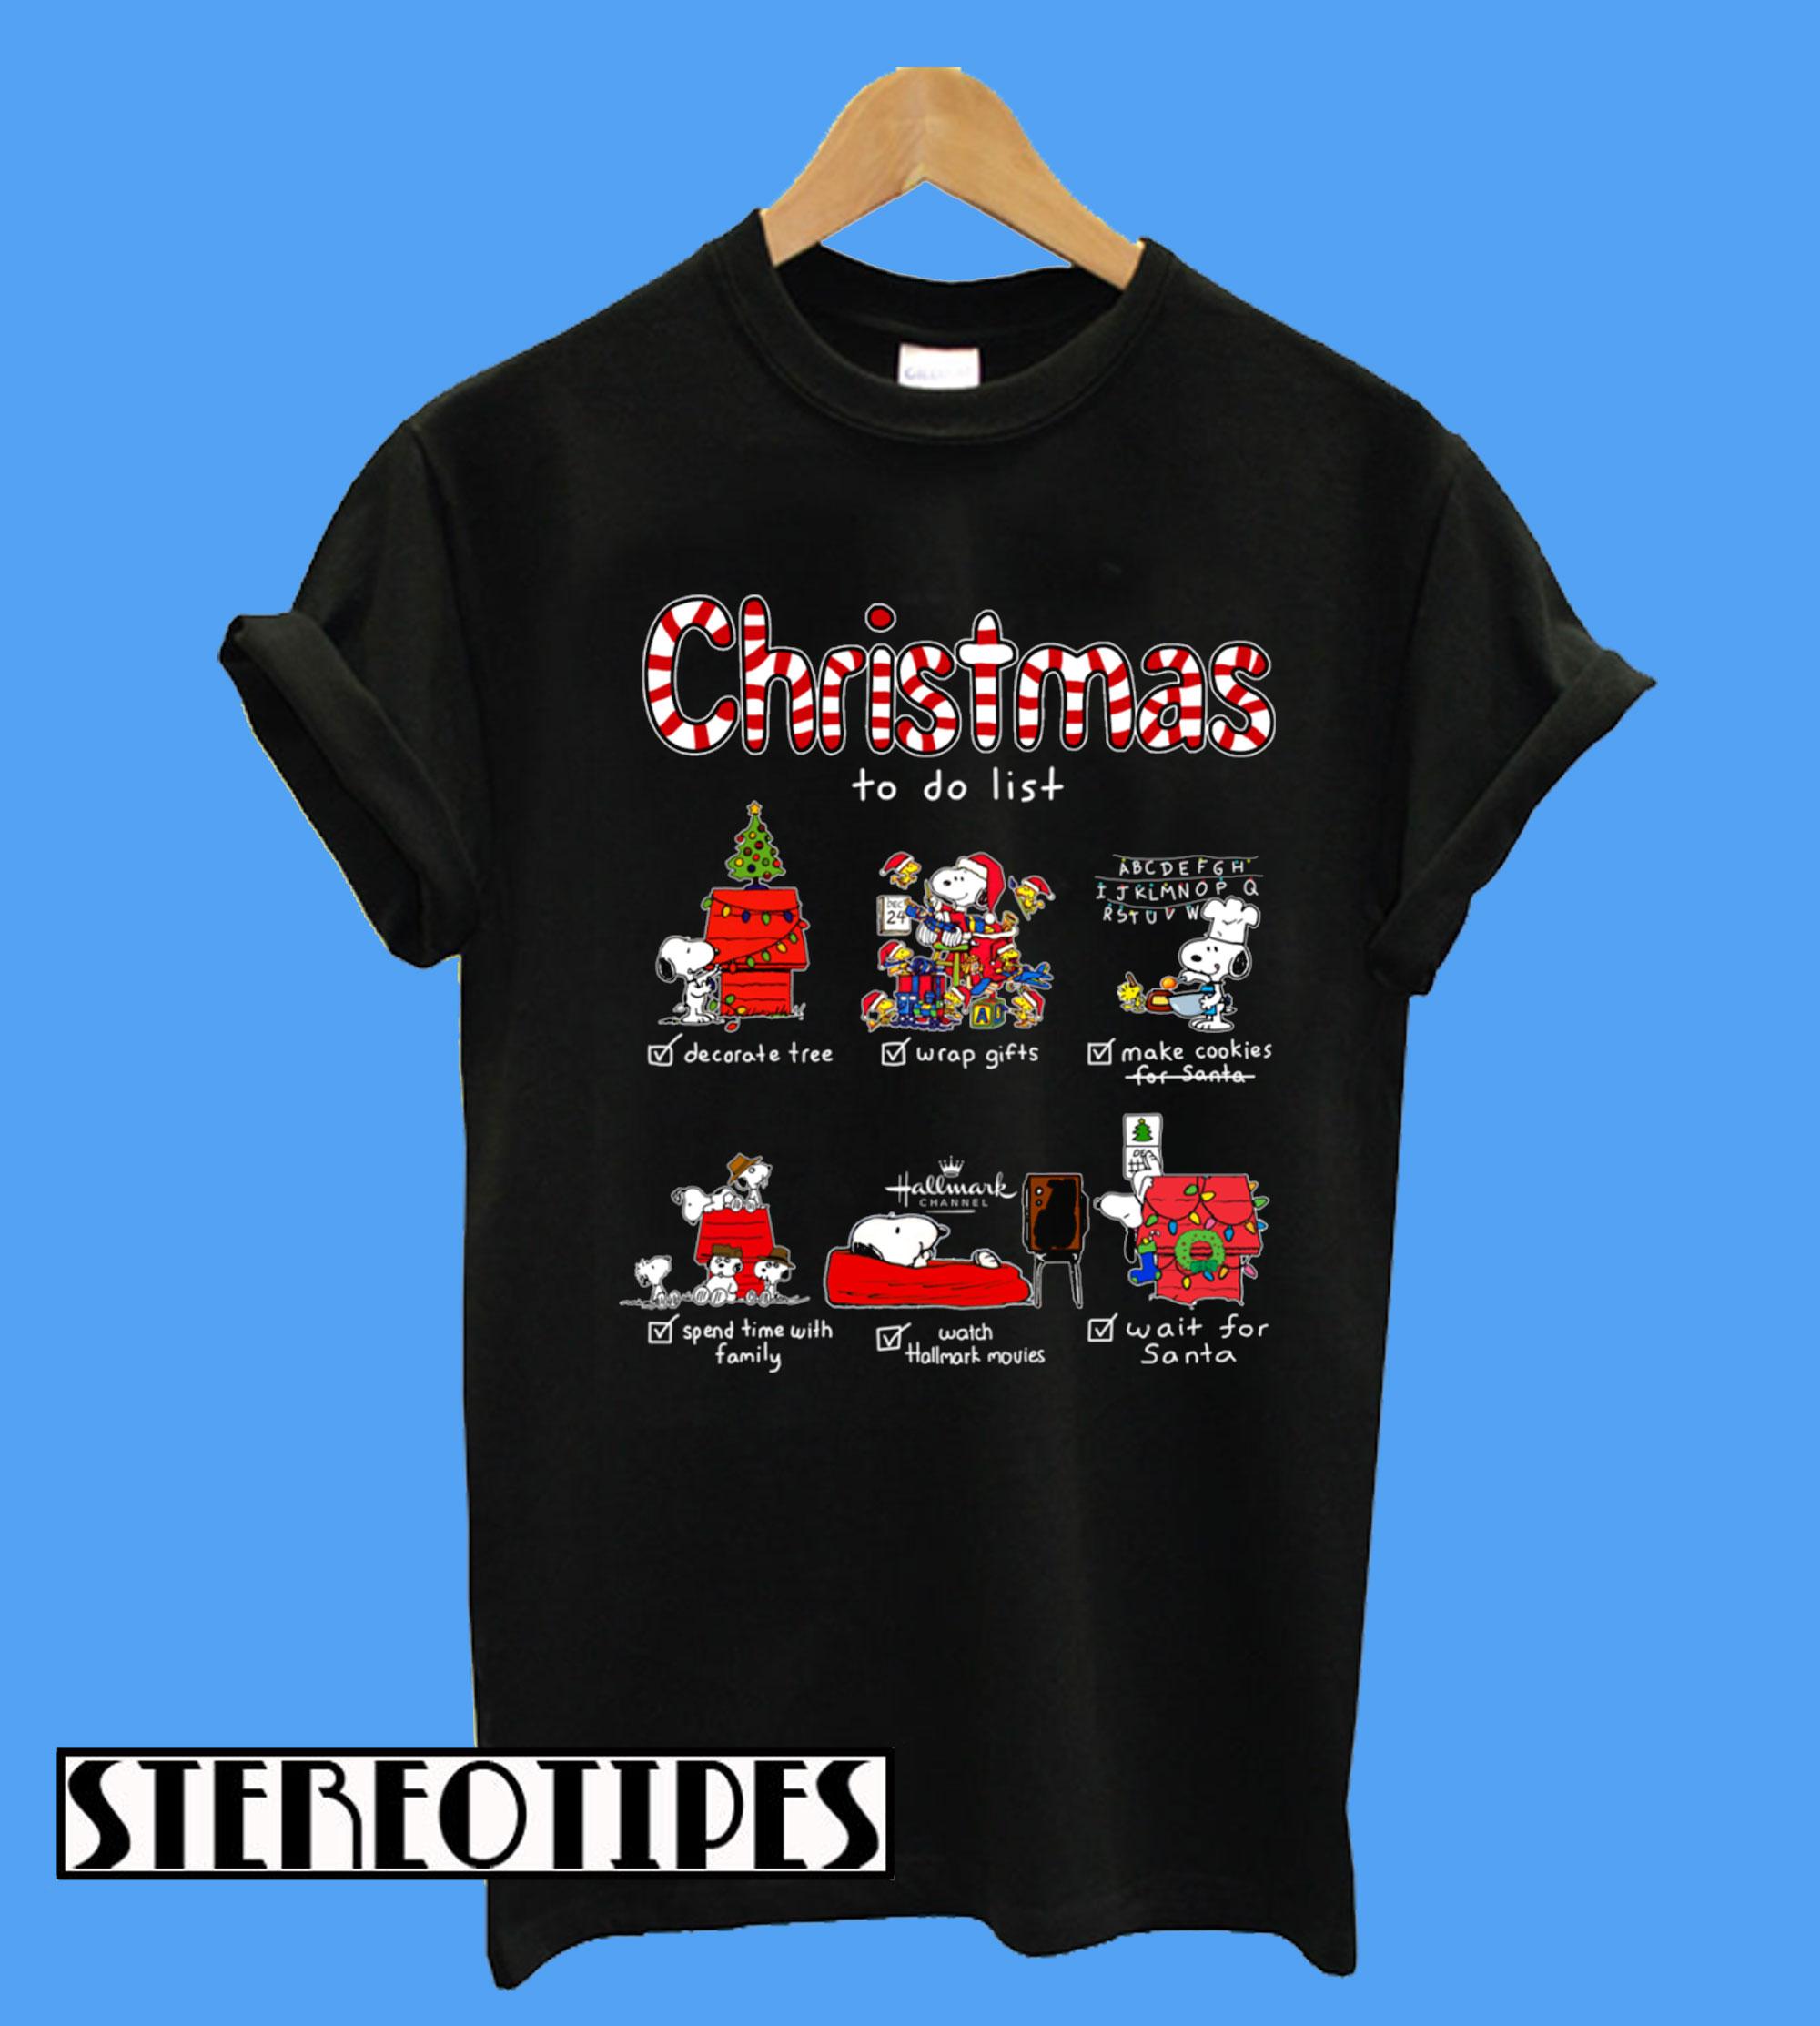 Hallmark Christmas T Shirt.Snoopy Christmas To Do List Hallmark Channel T Shirt